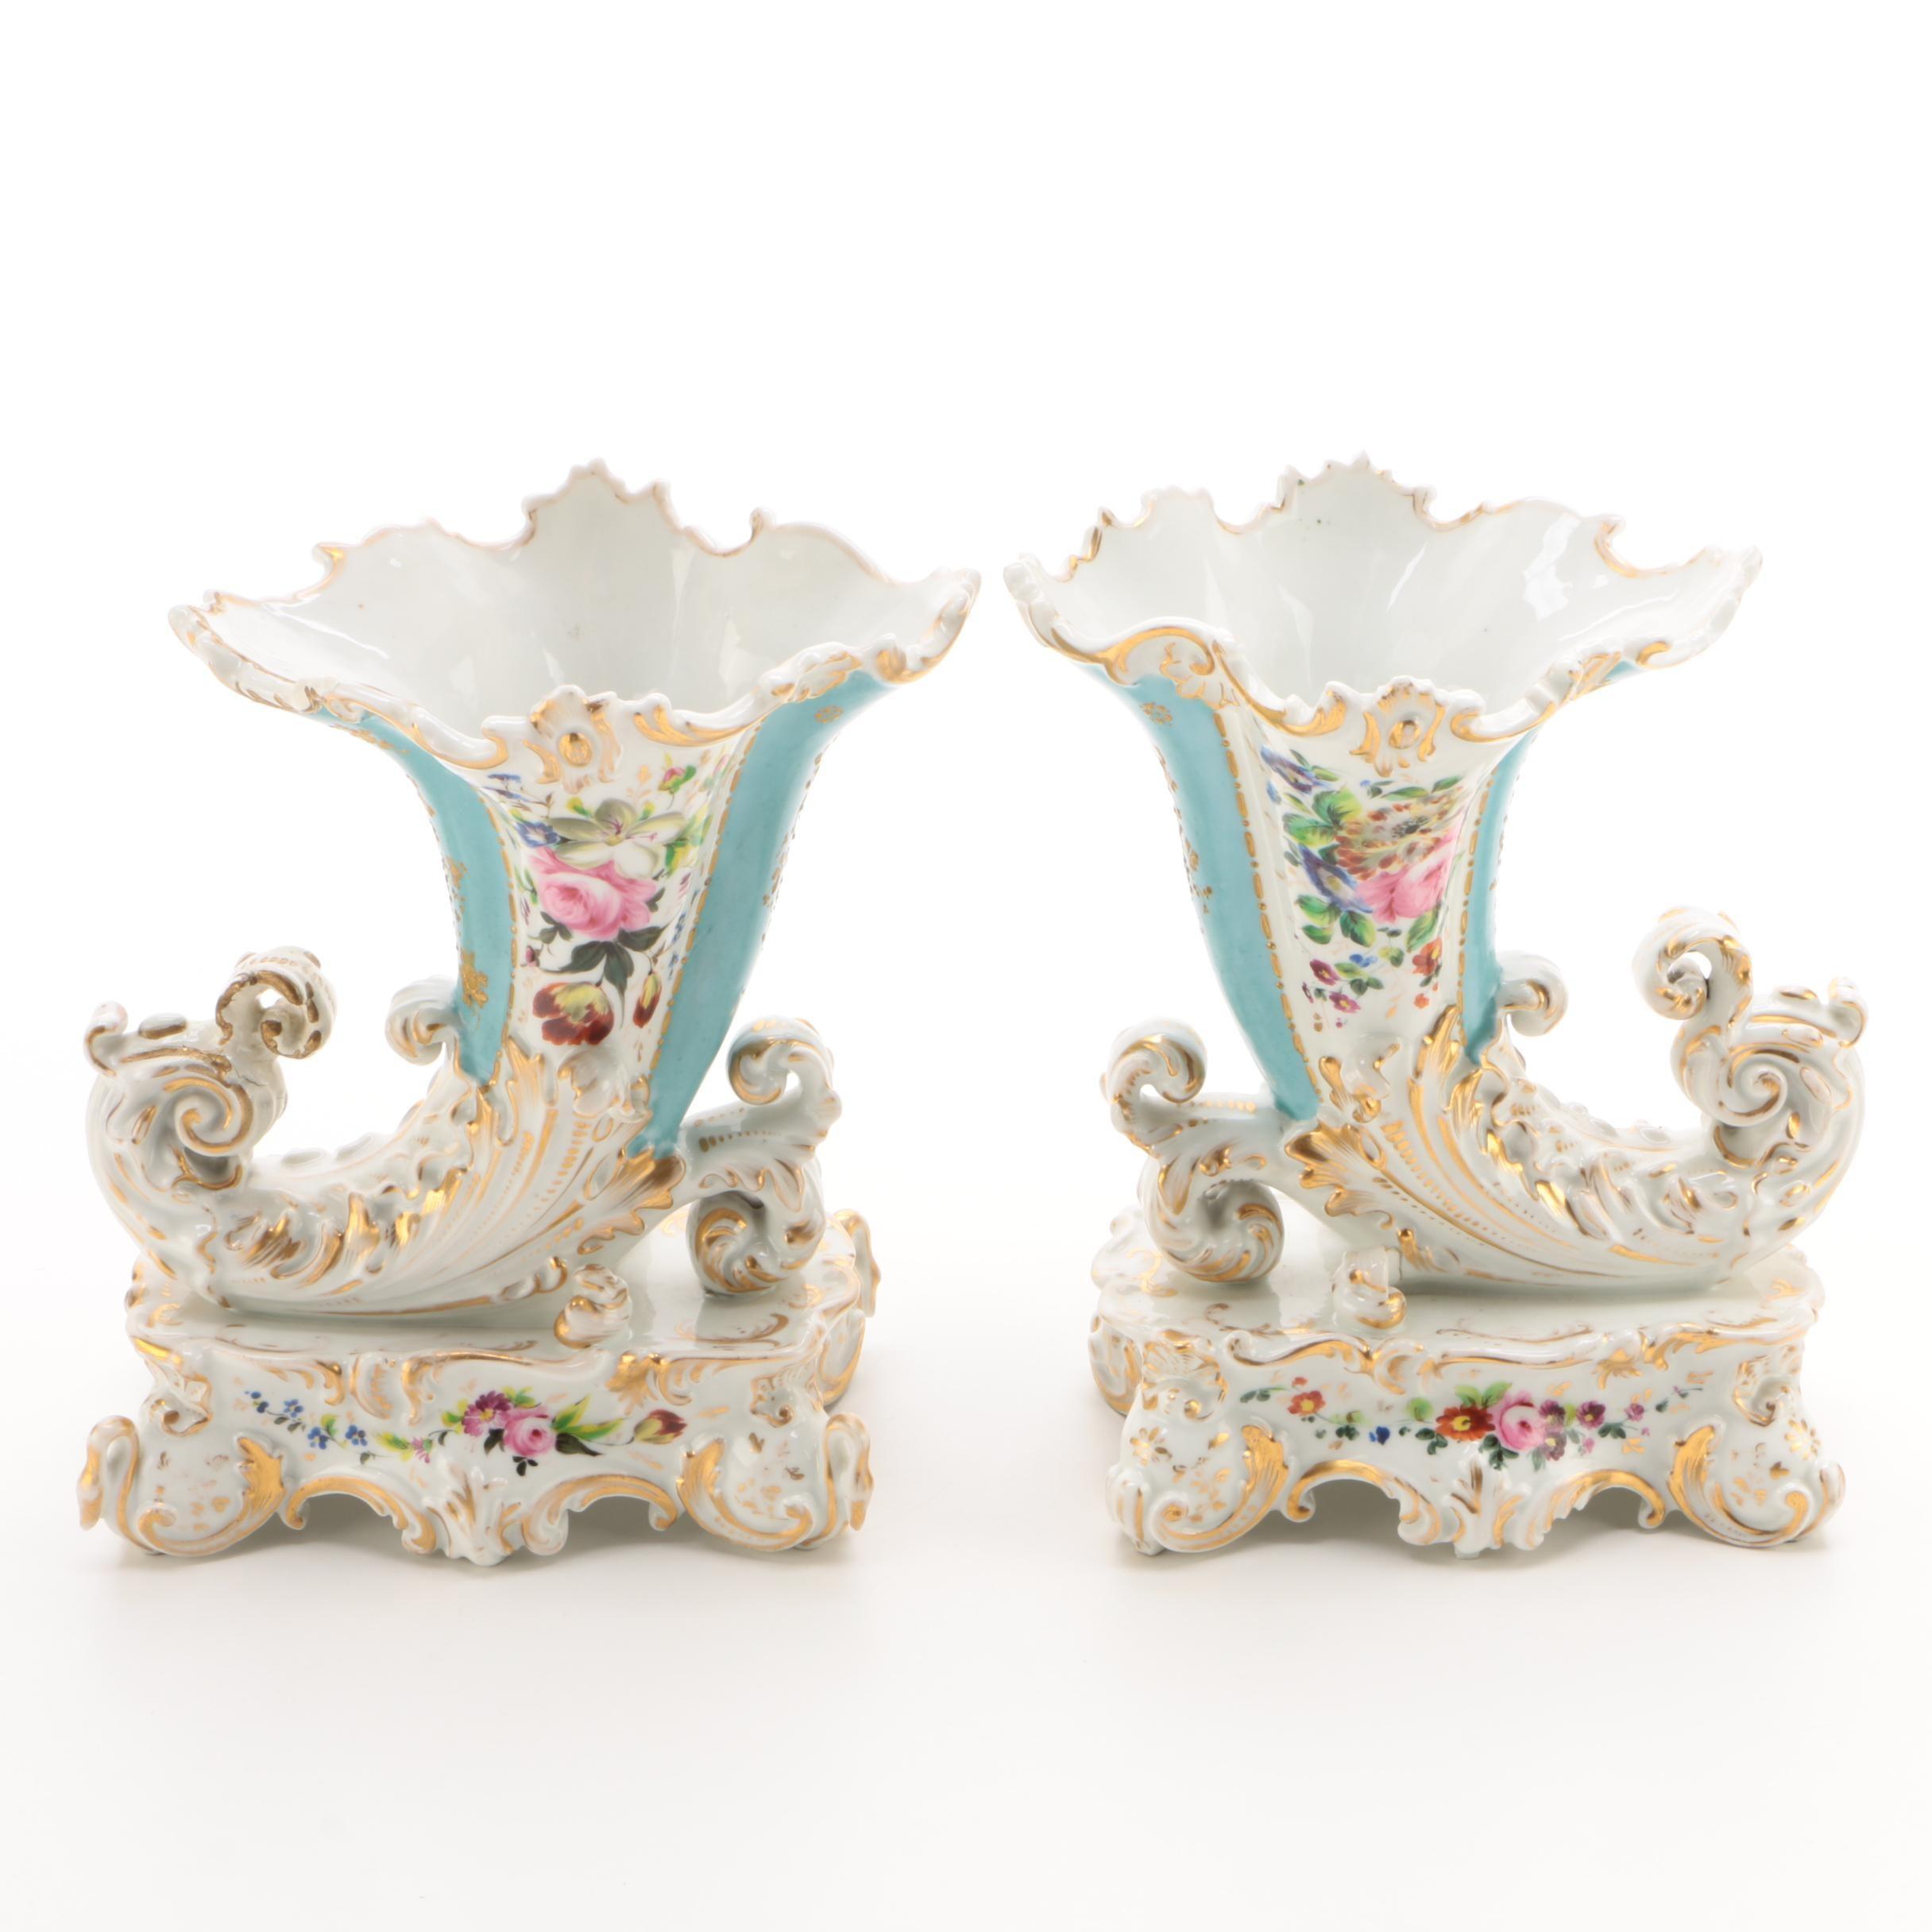 Jacob Petit Porcelain Cornucopia Vases, Circa 1830–1860